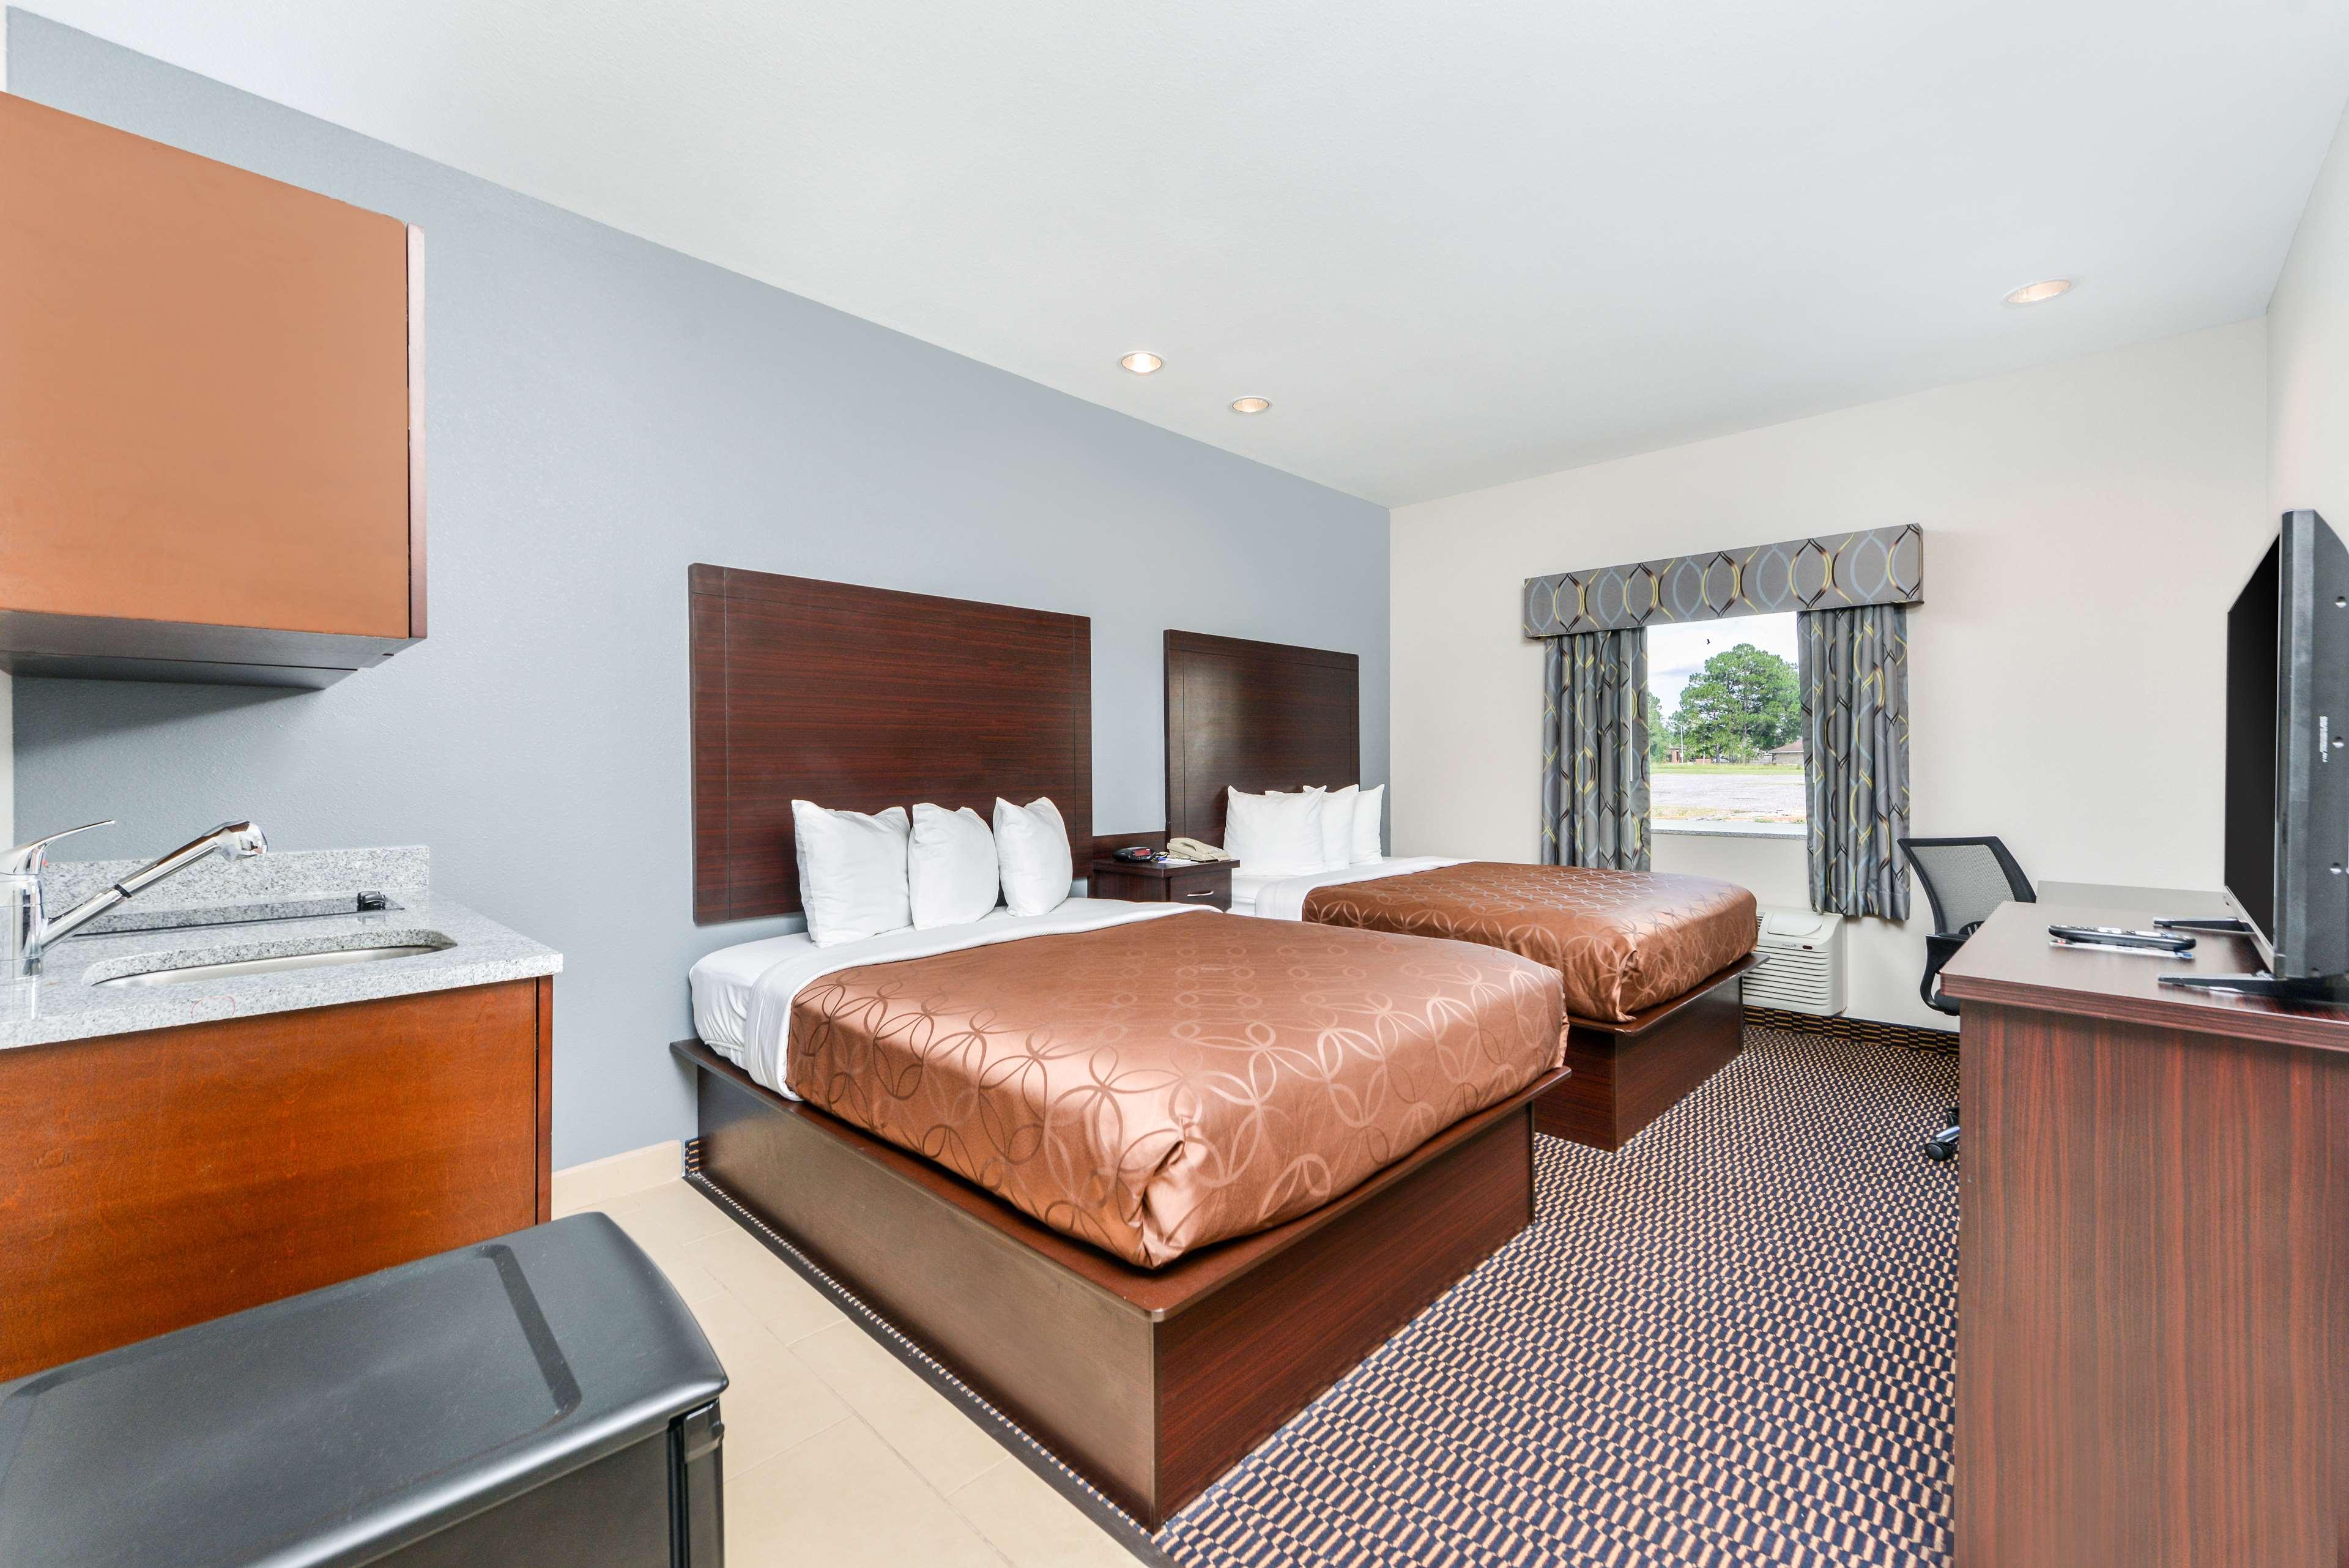 Americas Best Value Inn - Baton Rouge / College Drive image 9